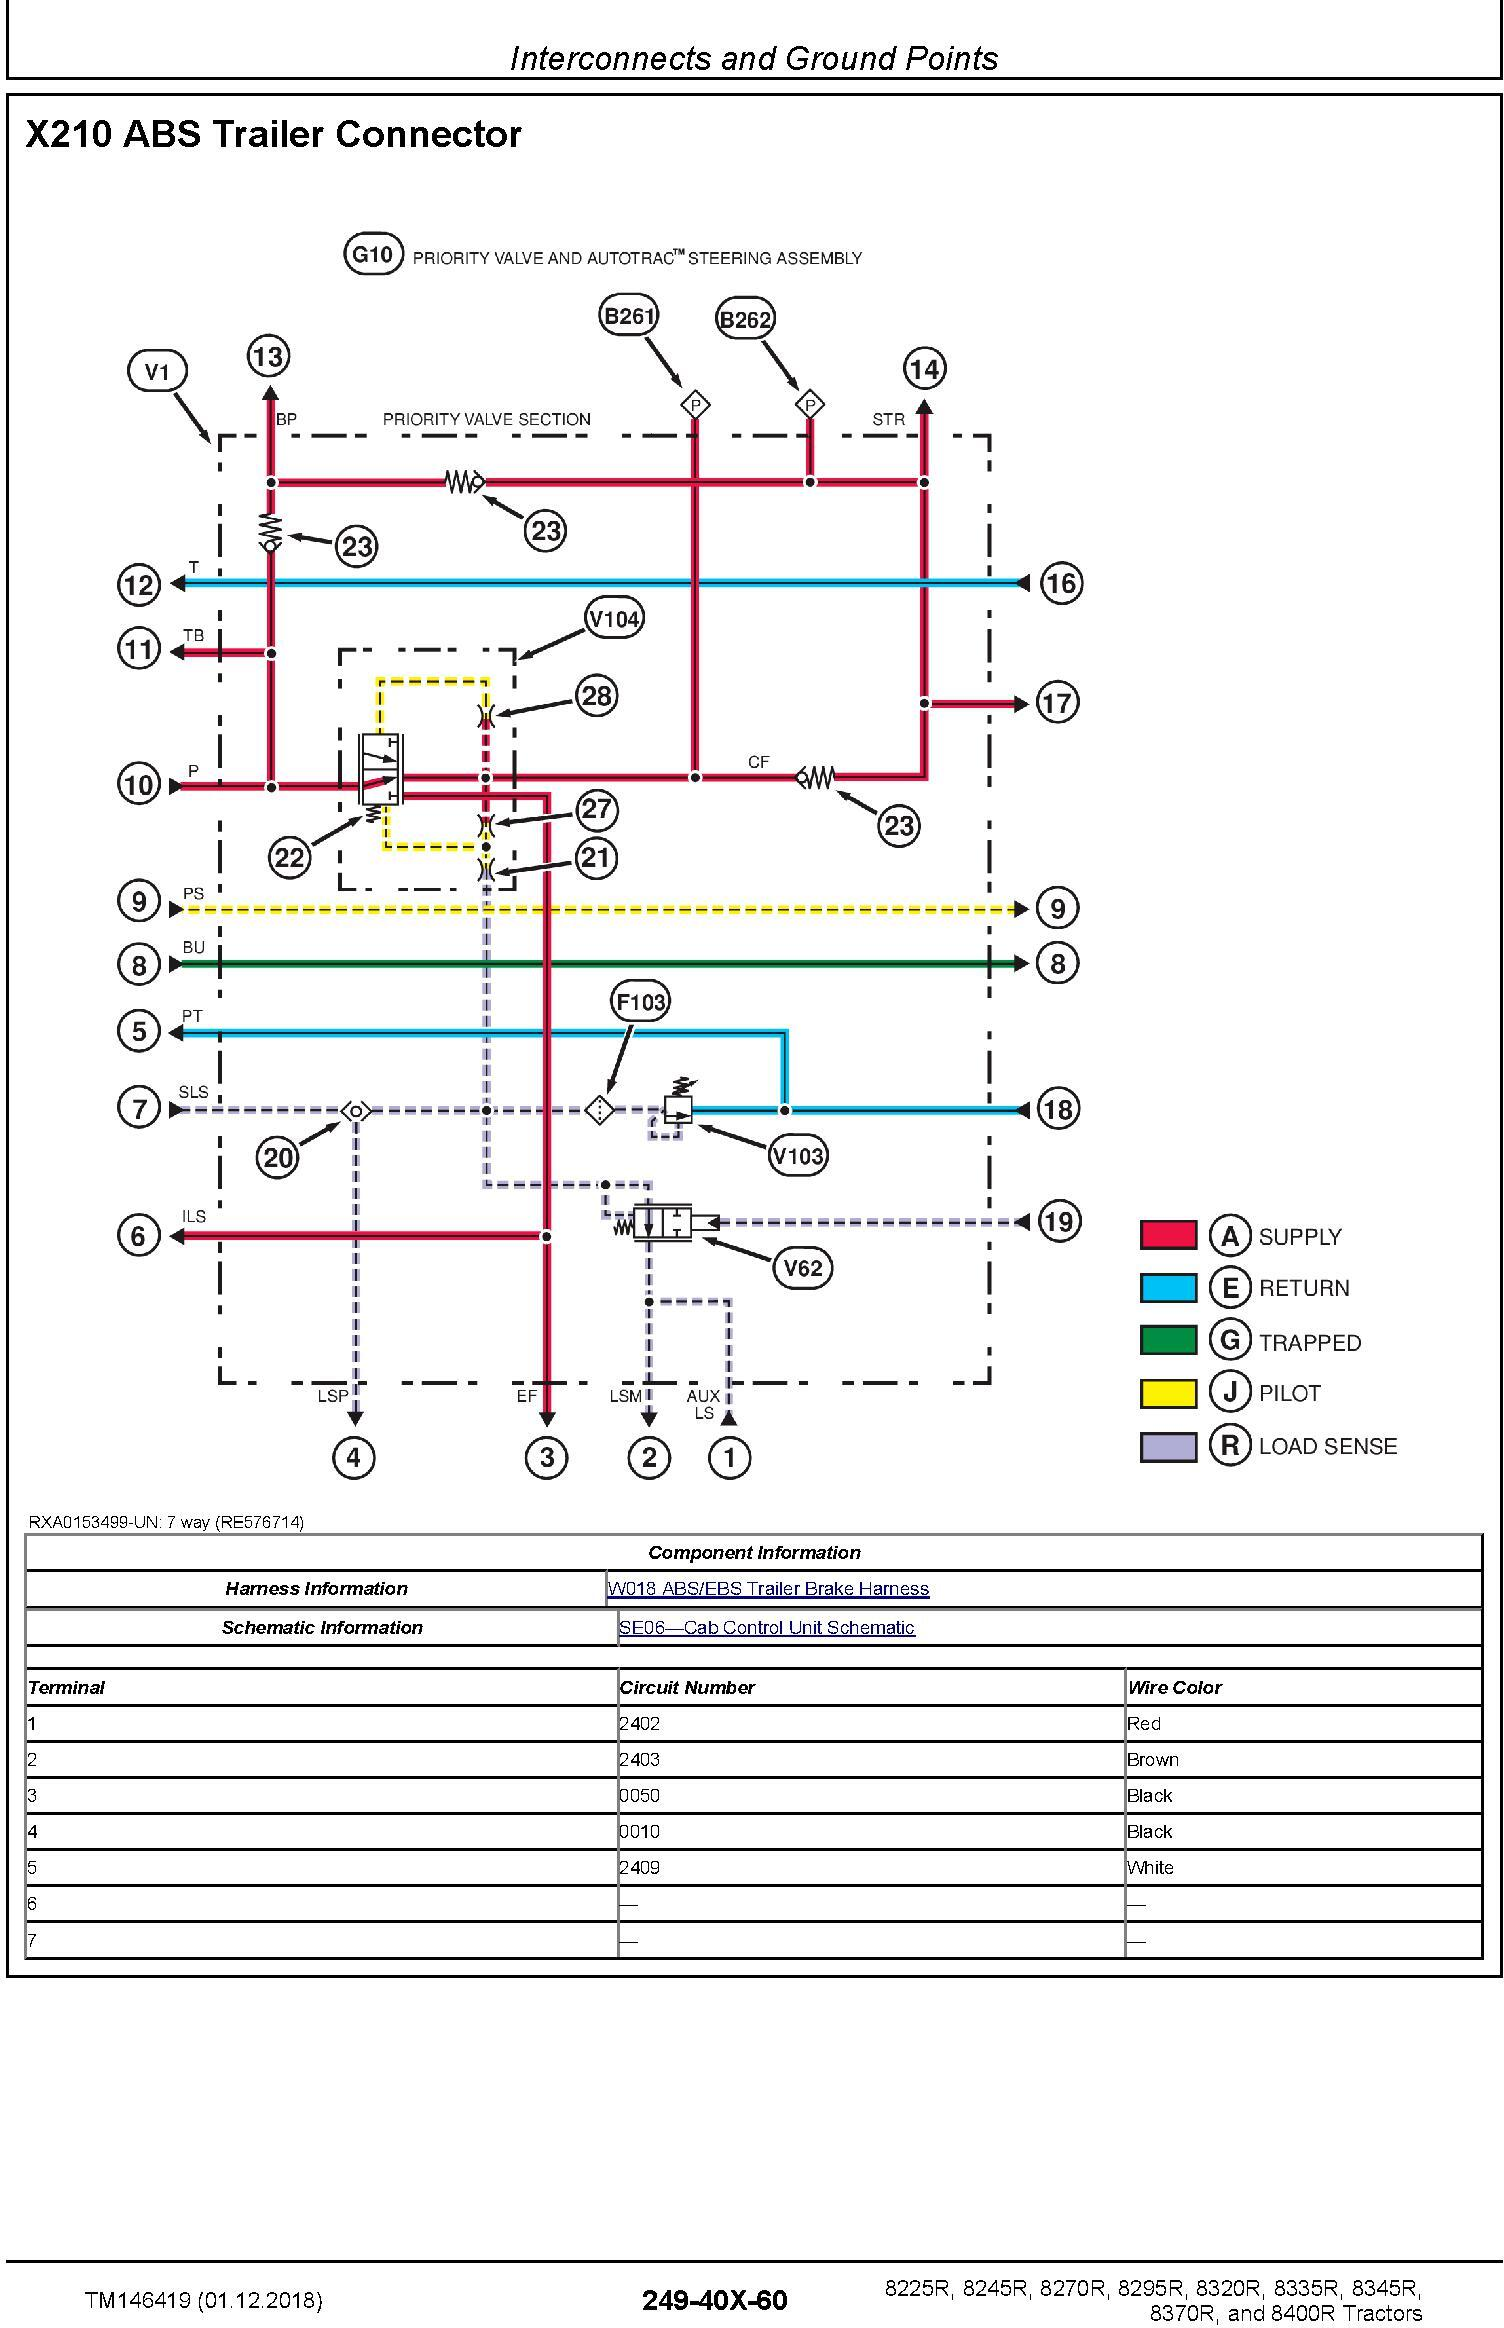 John Deere 8225R 8245R 8270R 8295R 8320R 8335R 8345R 8370R 8400R Tractors Diagnostic Manual TM146419 - 2